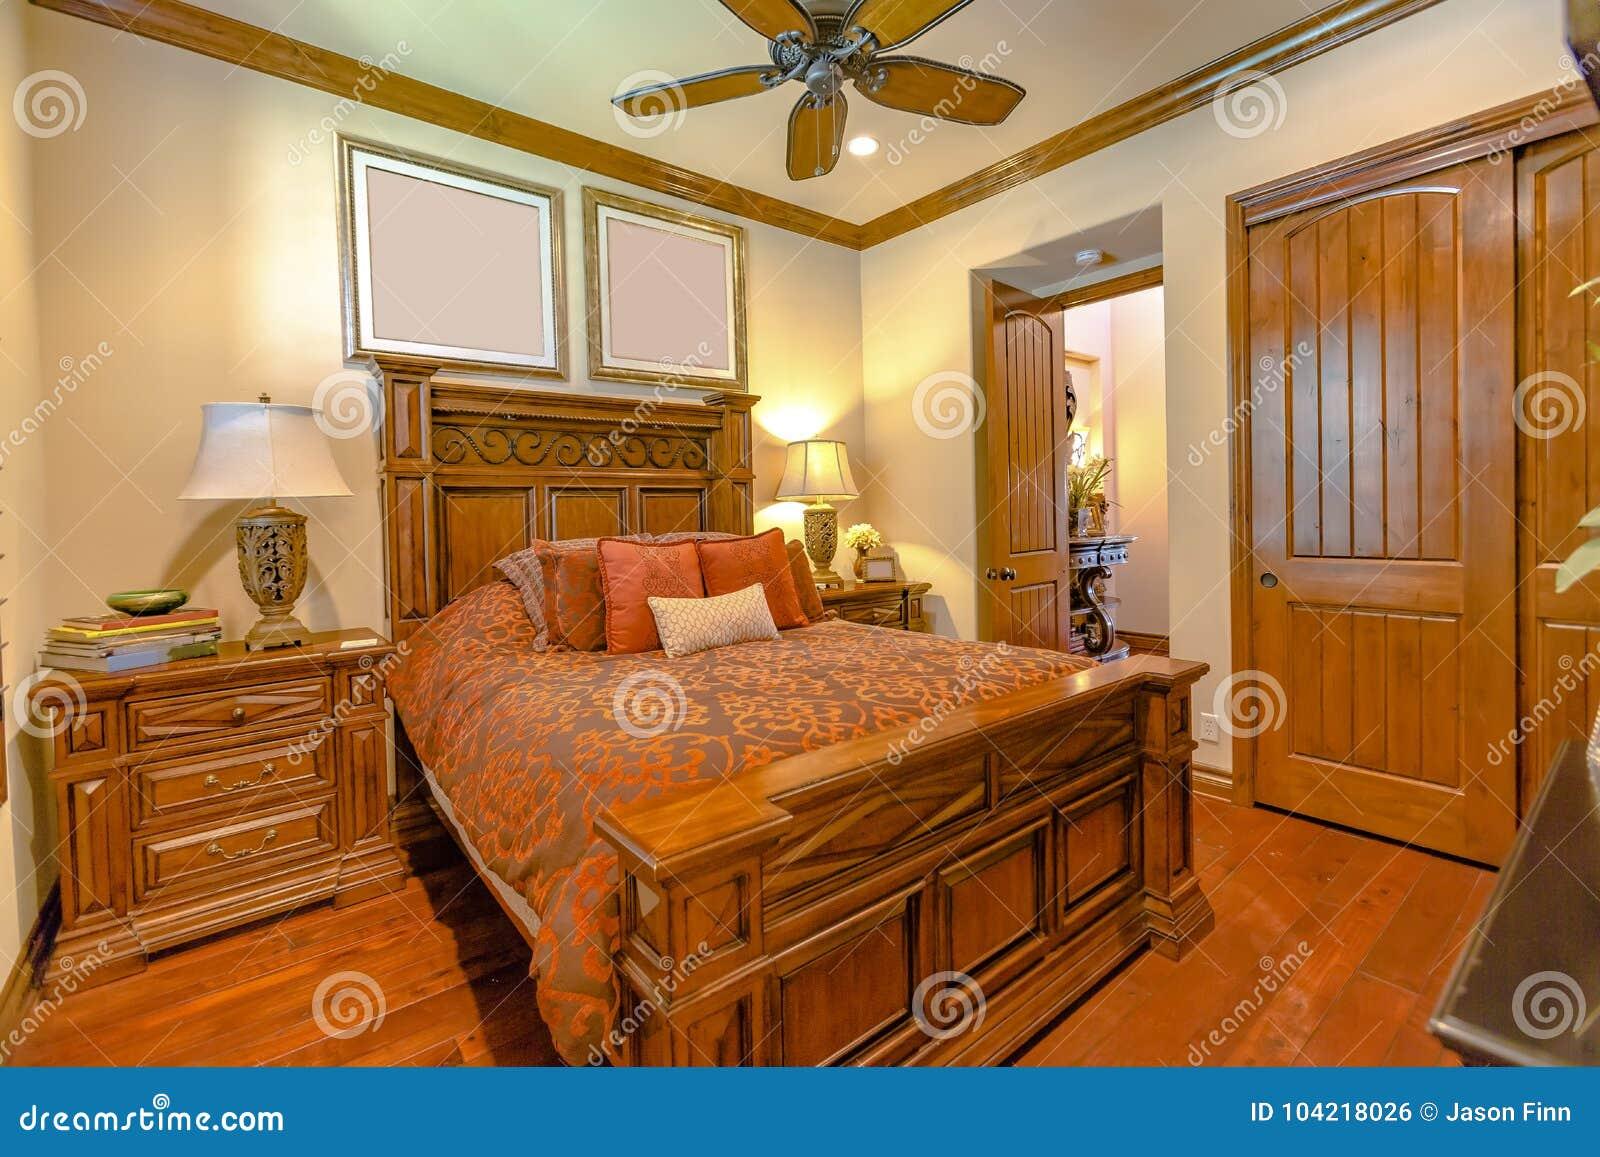 Luxury Bedroom In California Home With Maple Wood Floors